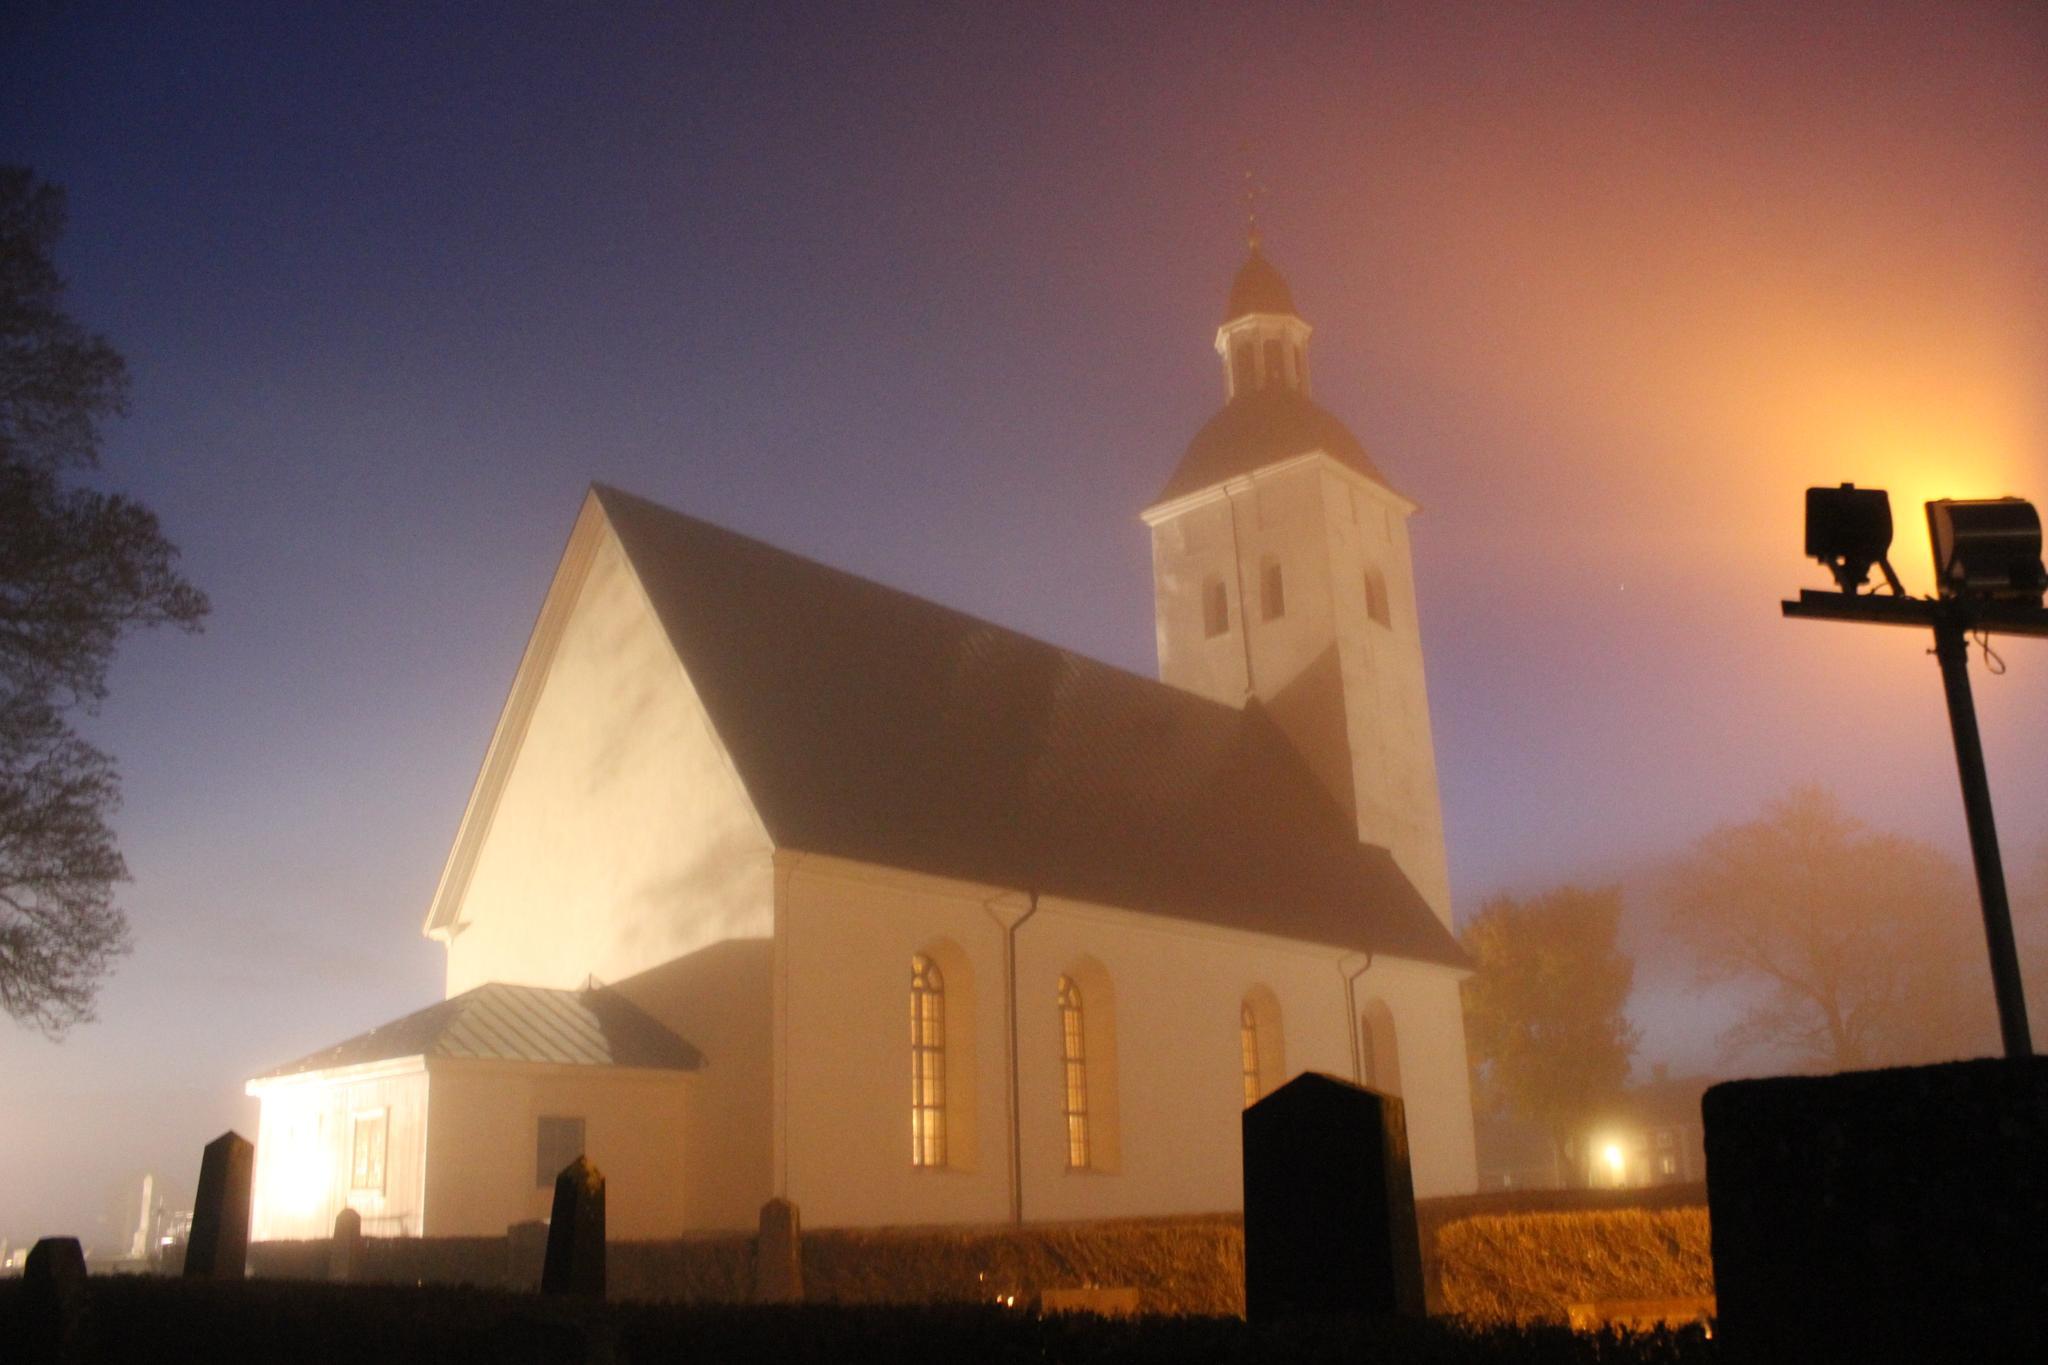 Hälsingtuna kyrka by pernillamia